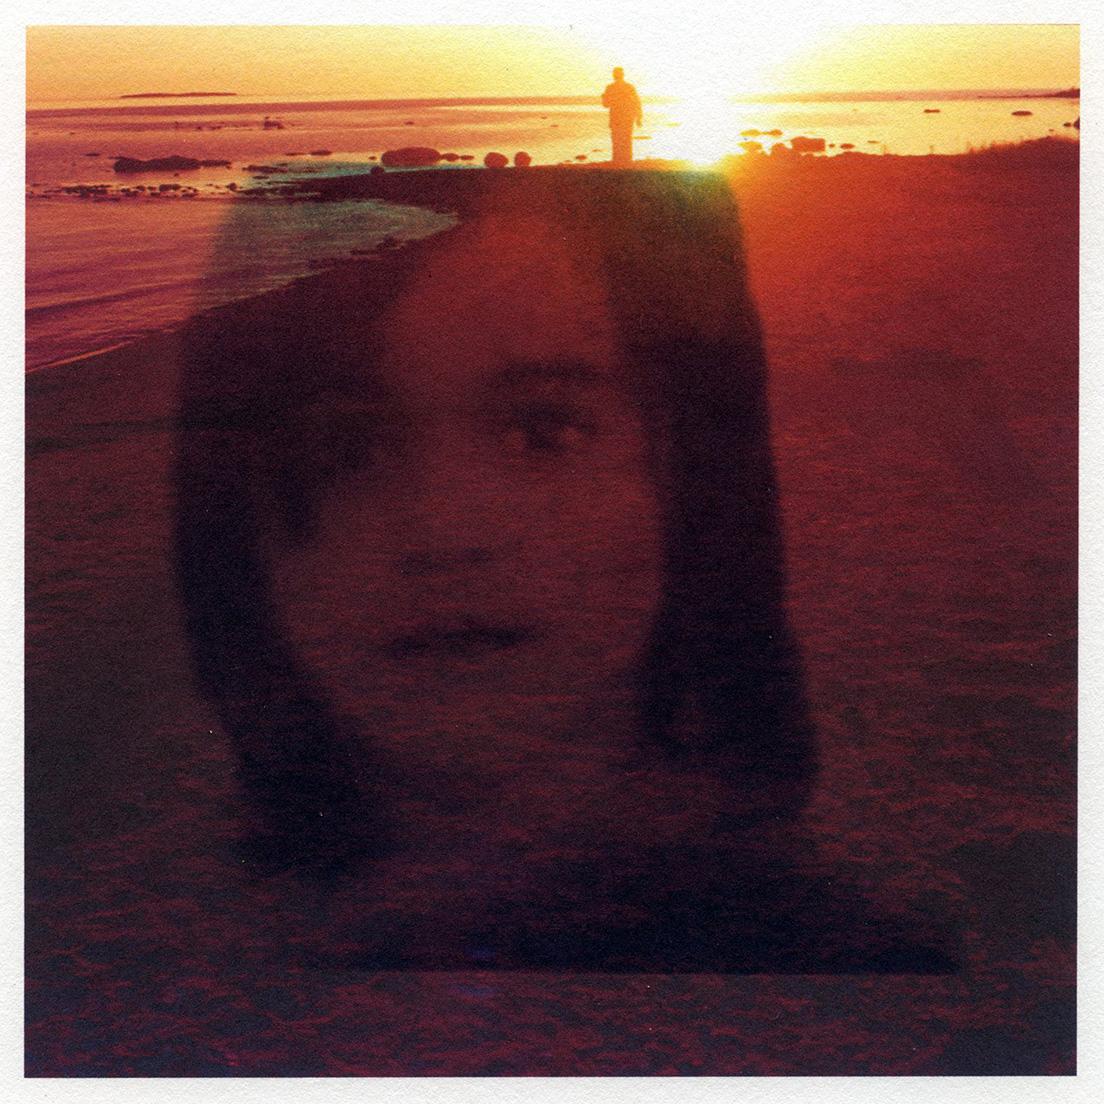 me & james sunset SM.jpg